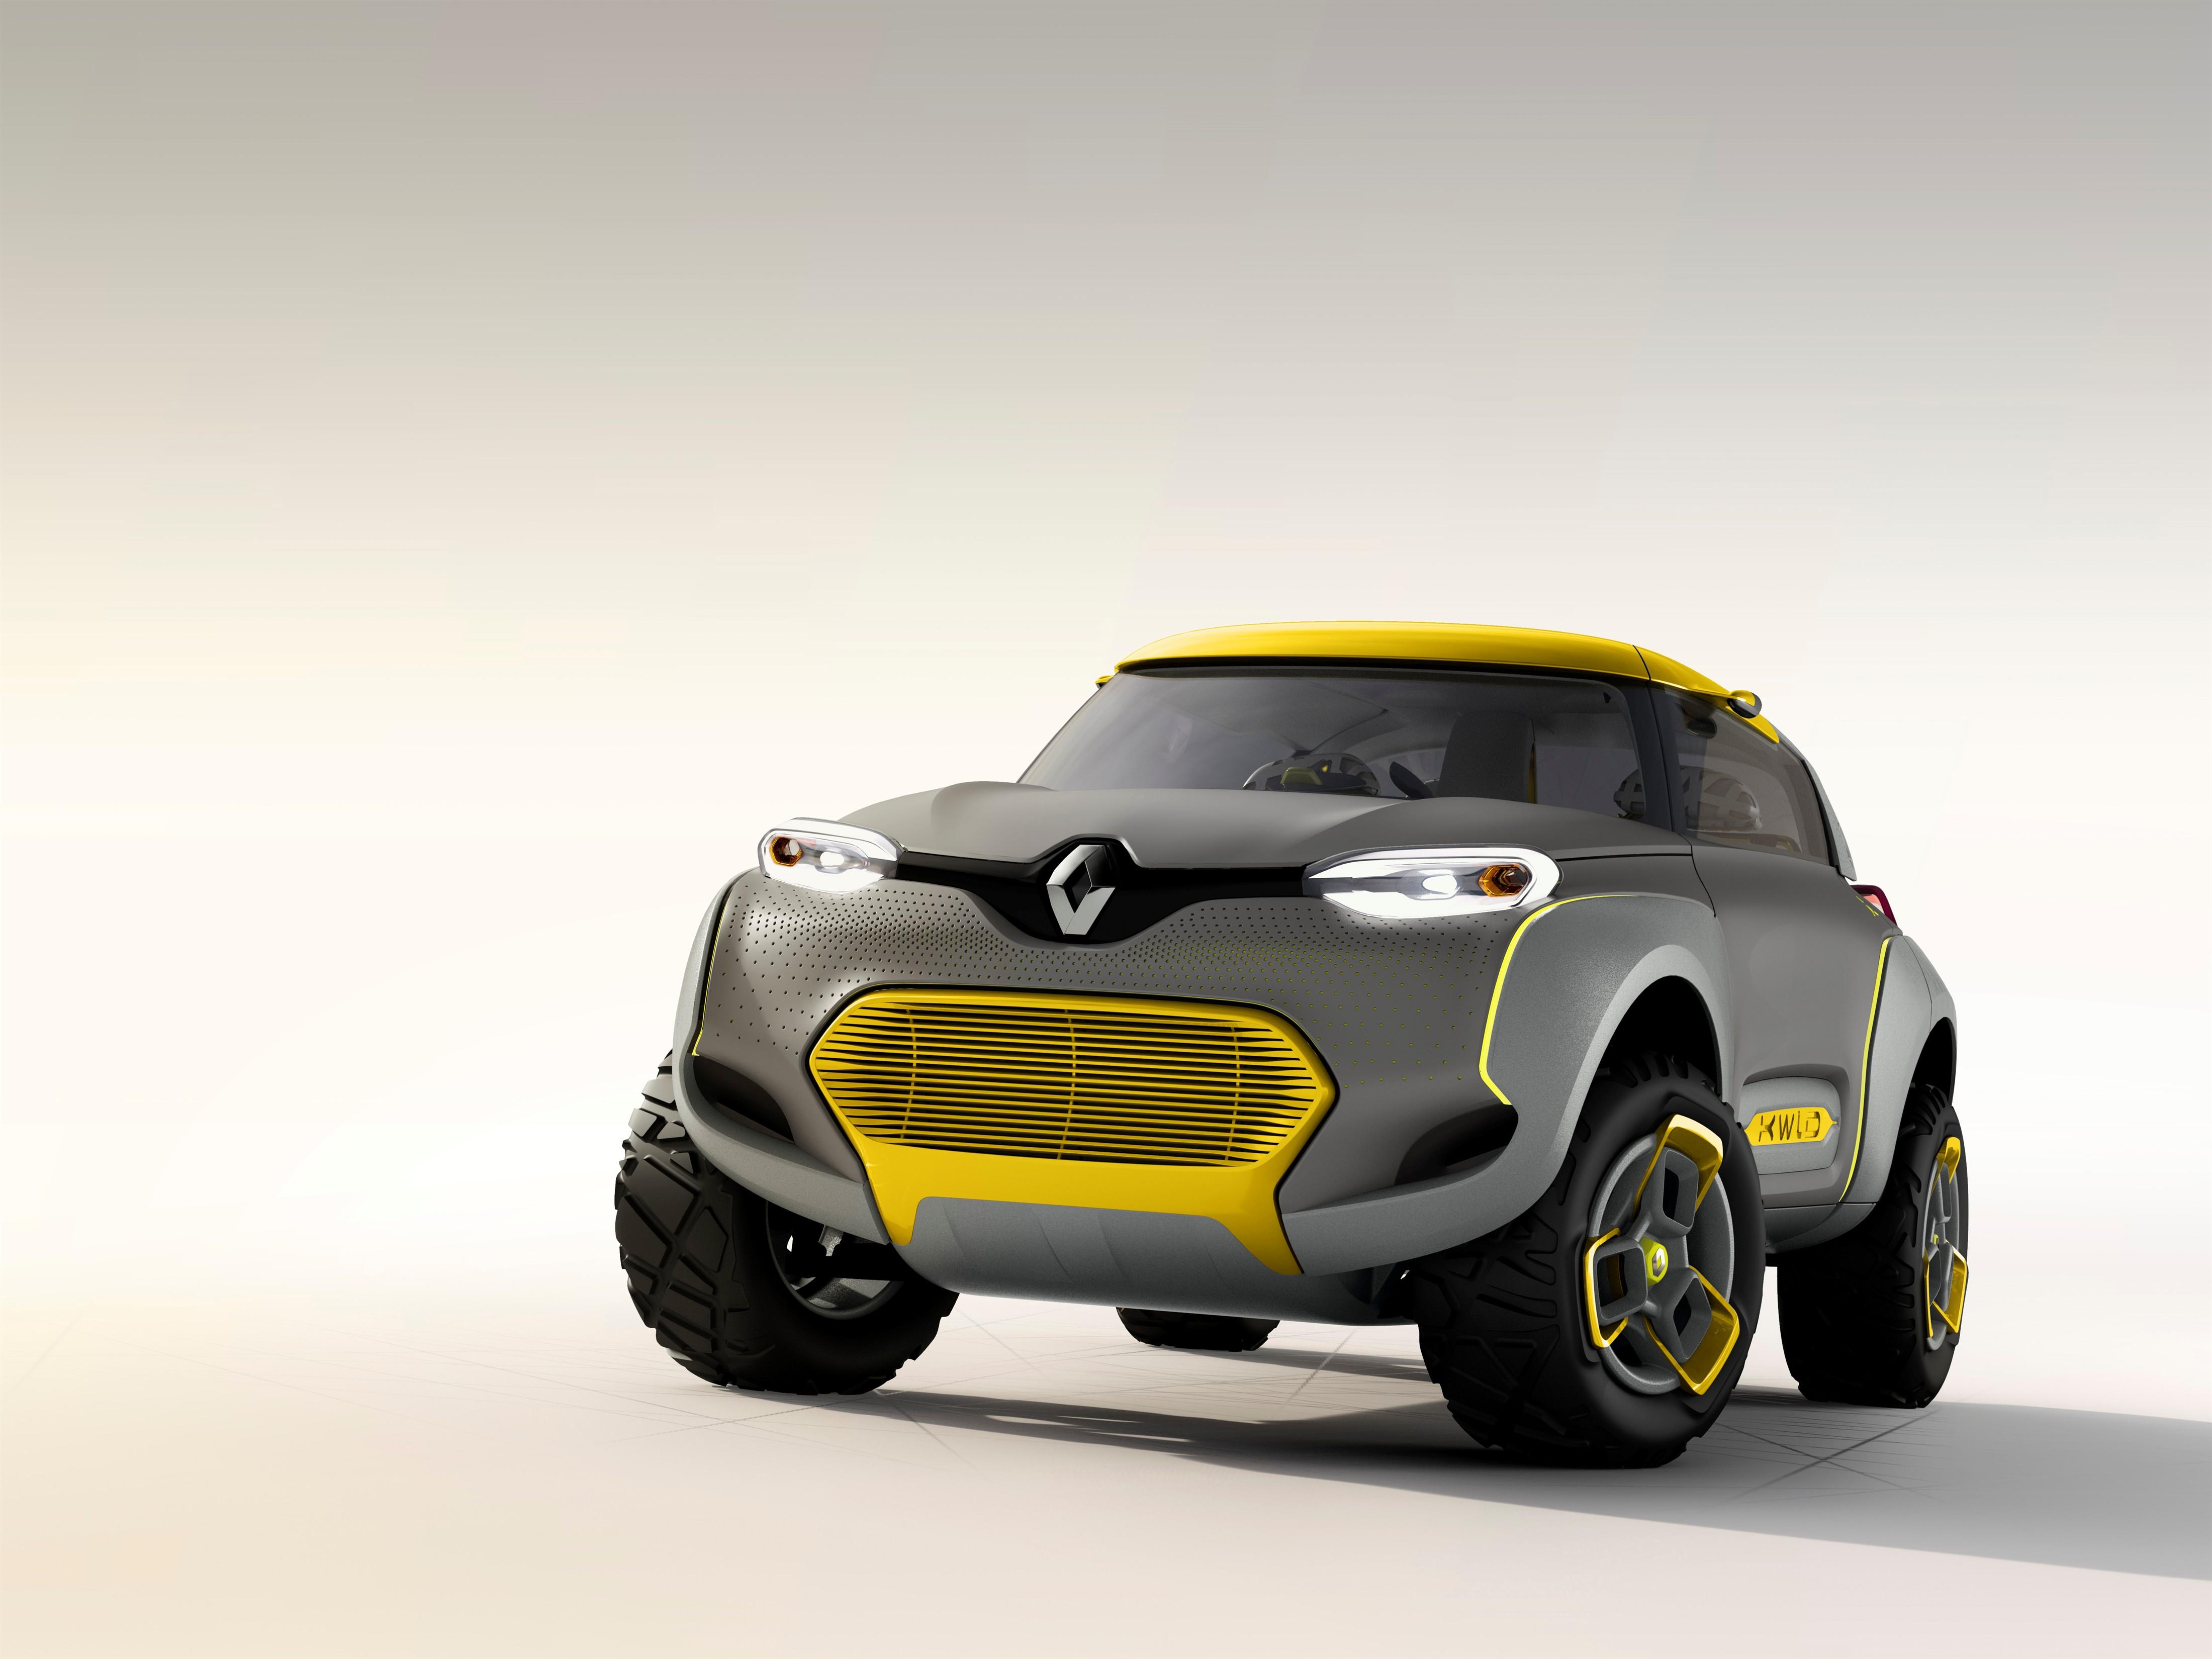 2018 Honda Civic Type R Specs >> Renault Kwid concept baby SUV revealed - photos | CarAdvice